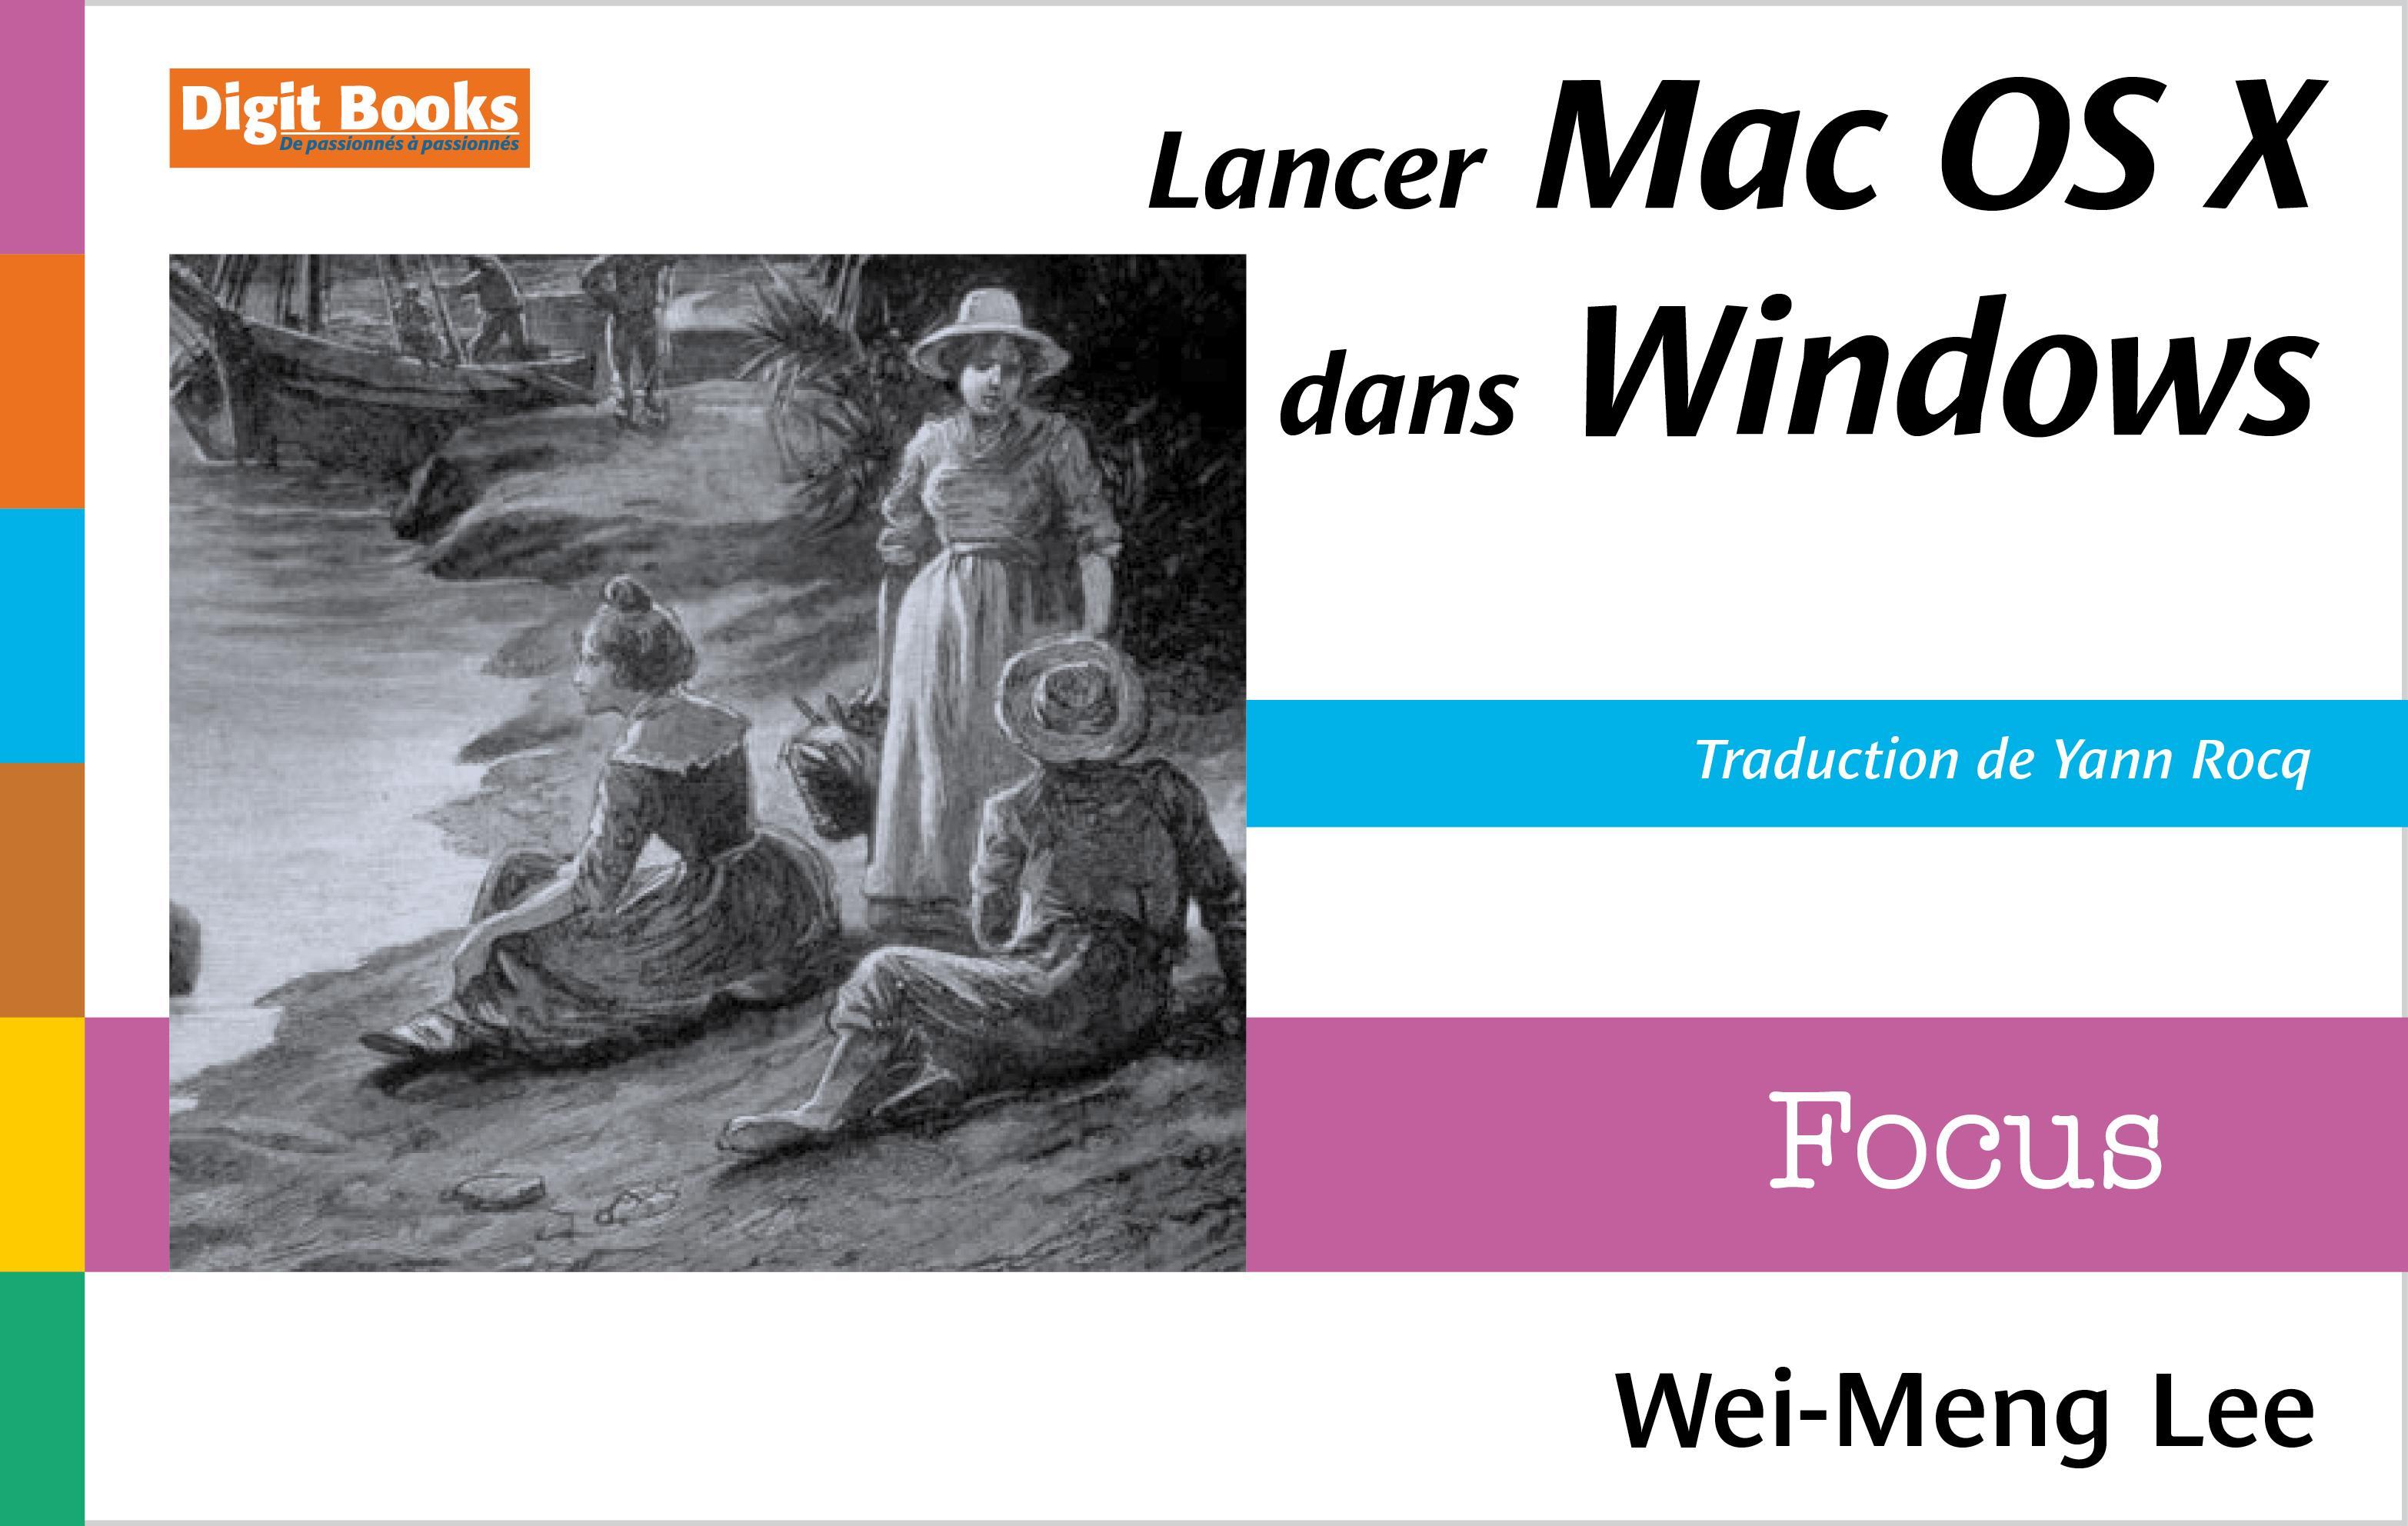 Lancer Mac OS X dans Windows